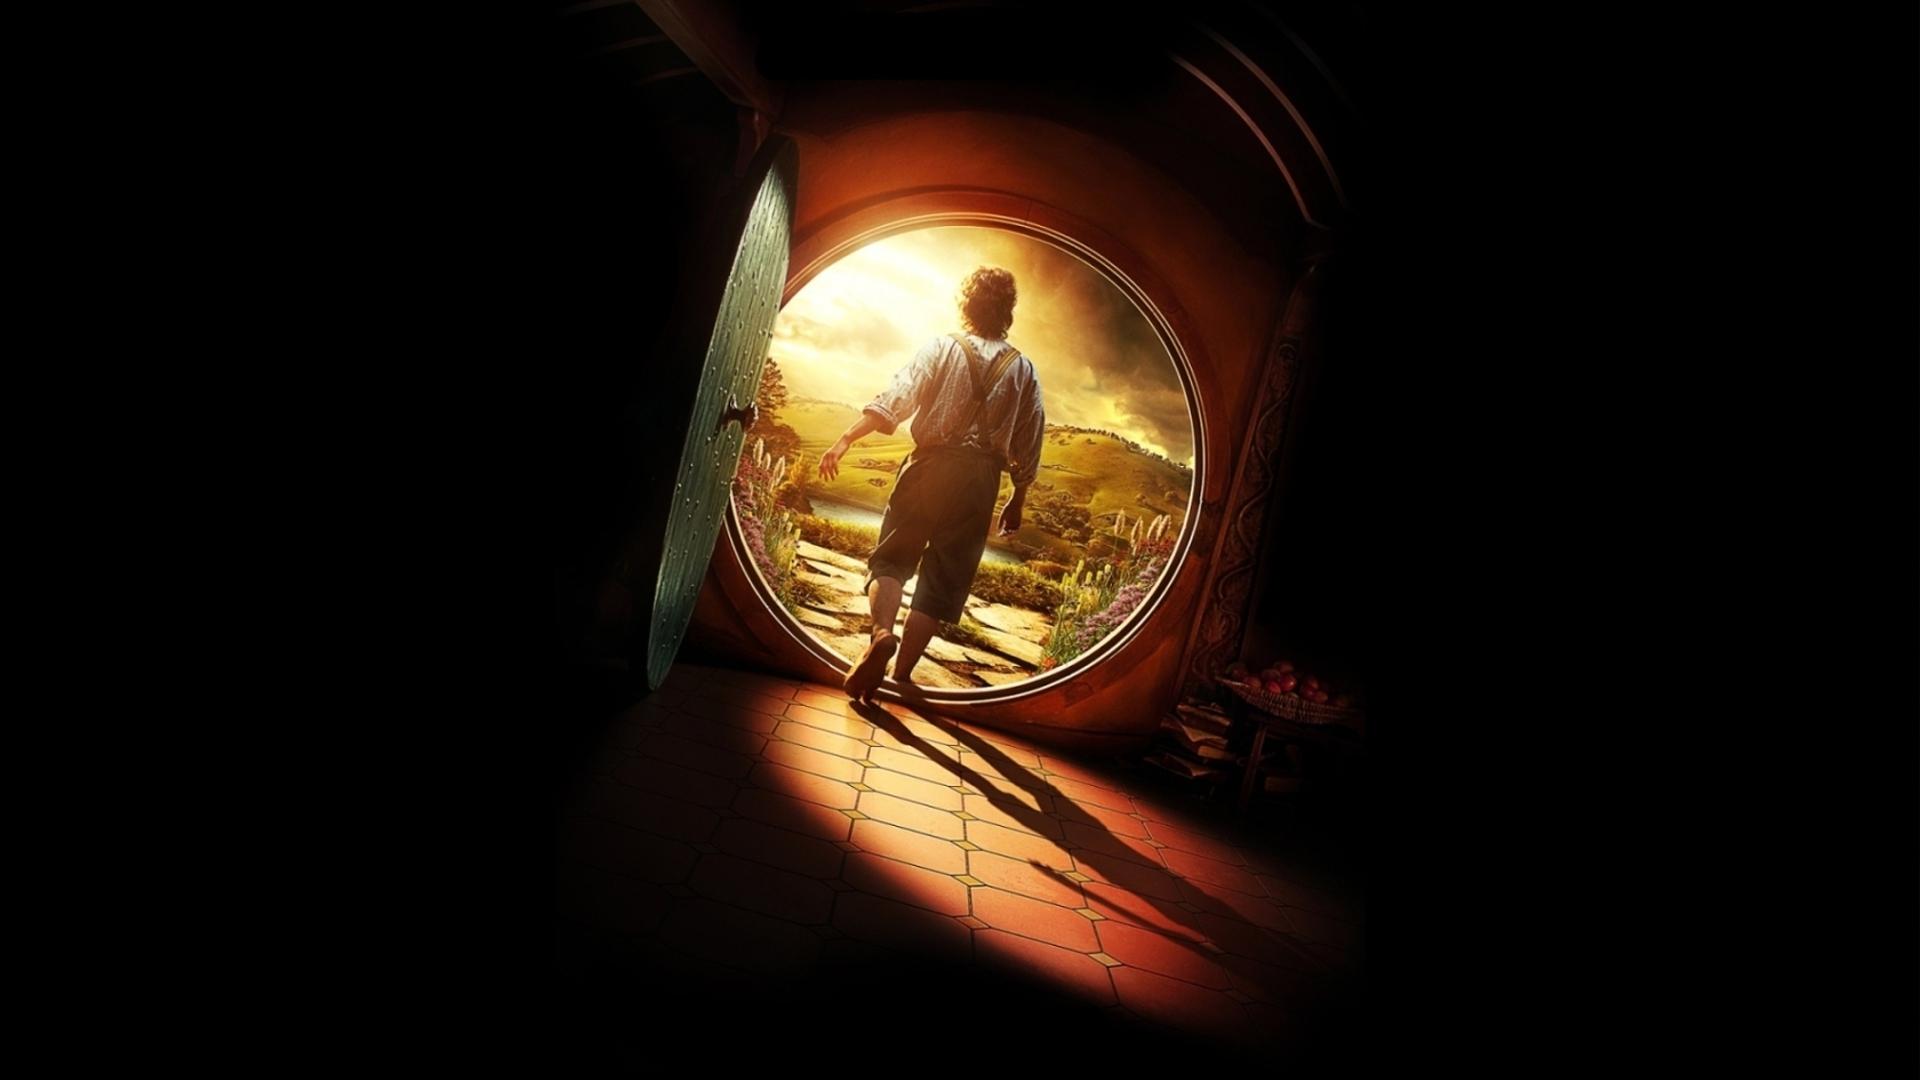 The hobbit an unexpected journey fanart